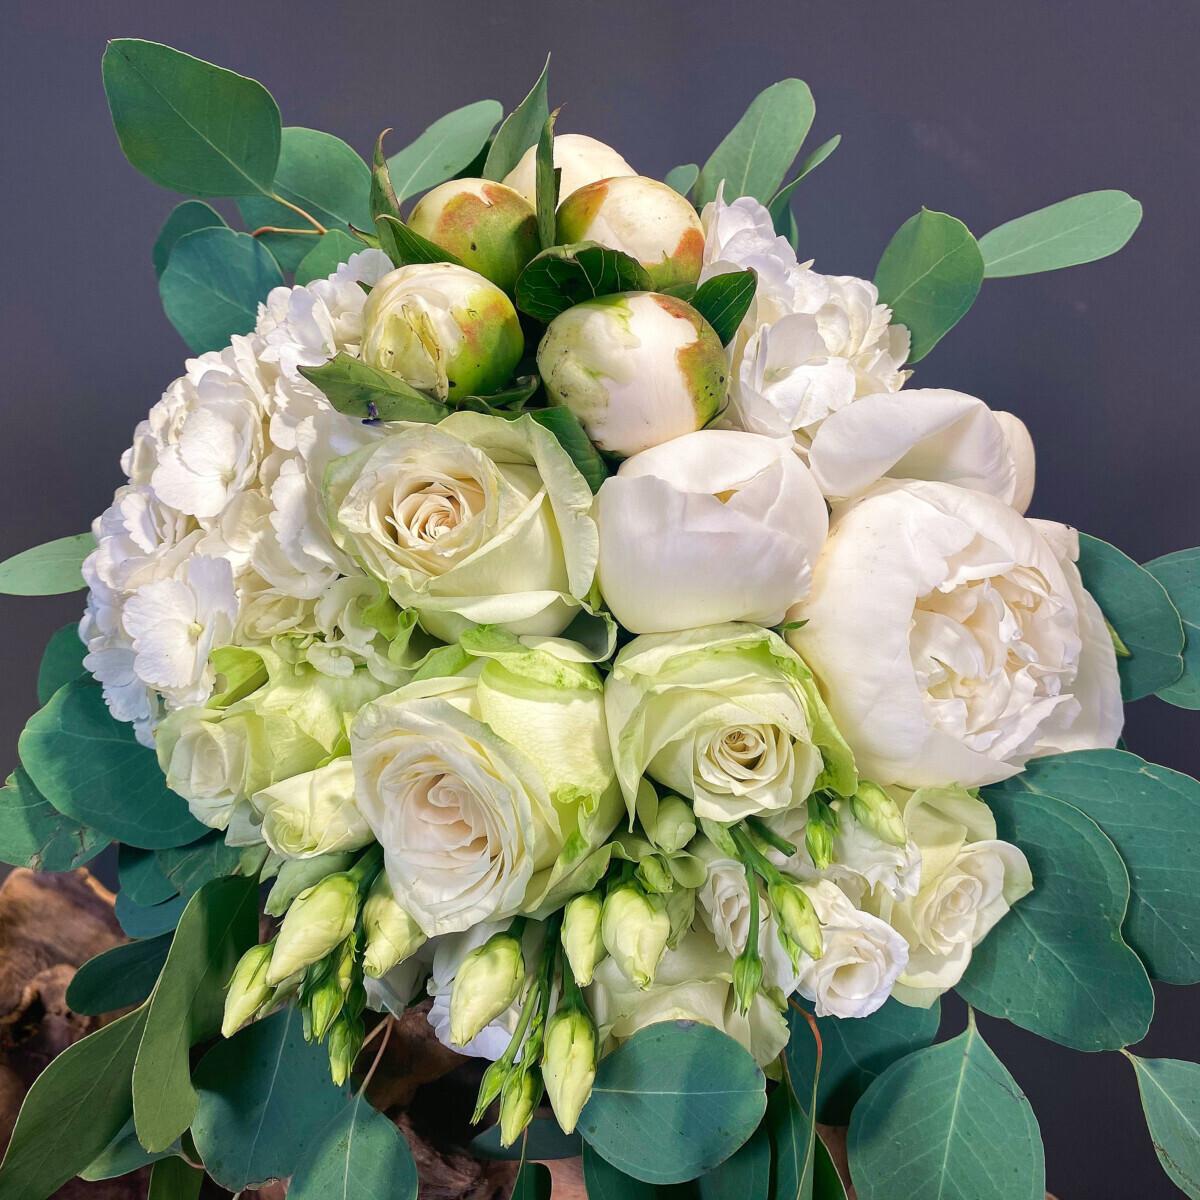 Bridal Bouquet White Peonies Hydrangeas Lisianthus Eucalyptus